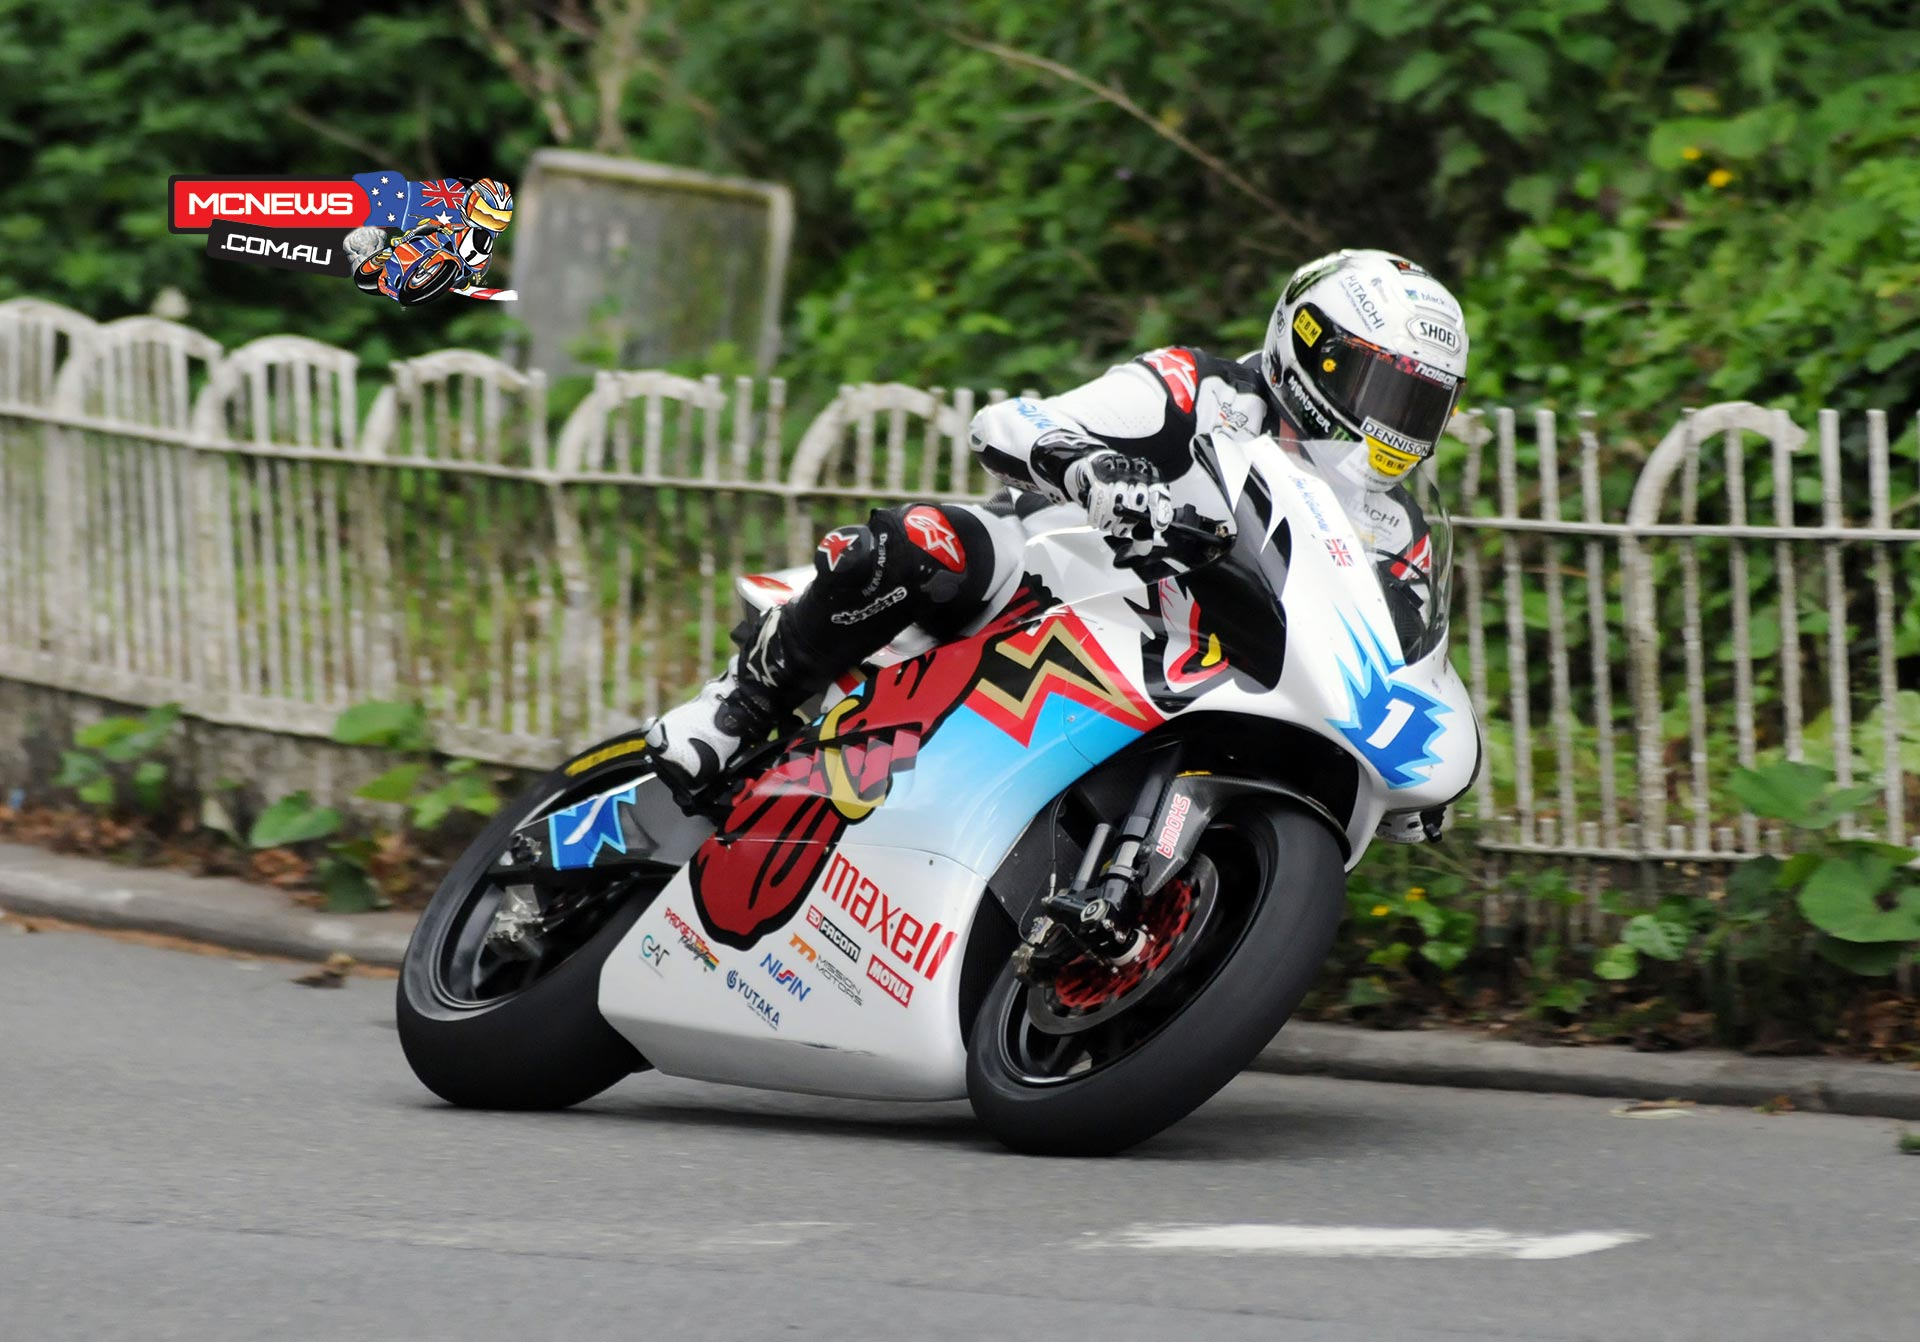 John McGuinness won his 21st TT race on Wednesday morning when he took the SES TT Zero race in record-breaking style.